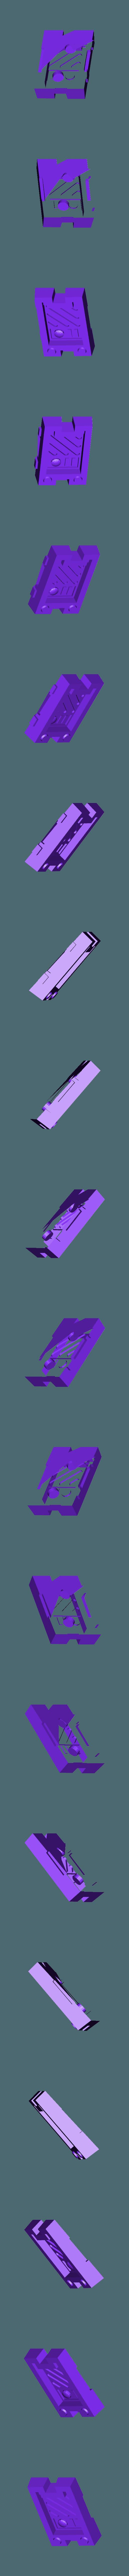 3Storm_Surge_half_of_power_packX2.obj Download free OBJ file Tempest Rush Mech • 3D printer model, Leesedrenfort